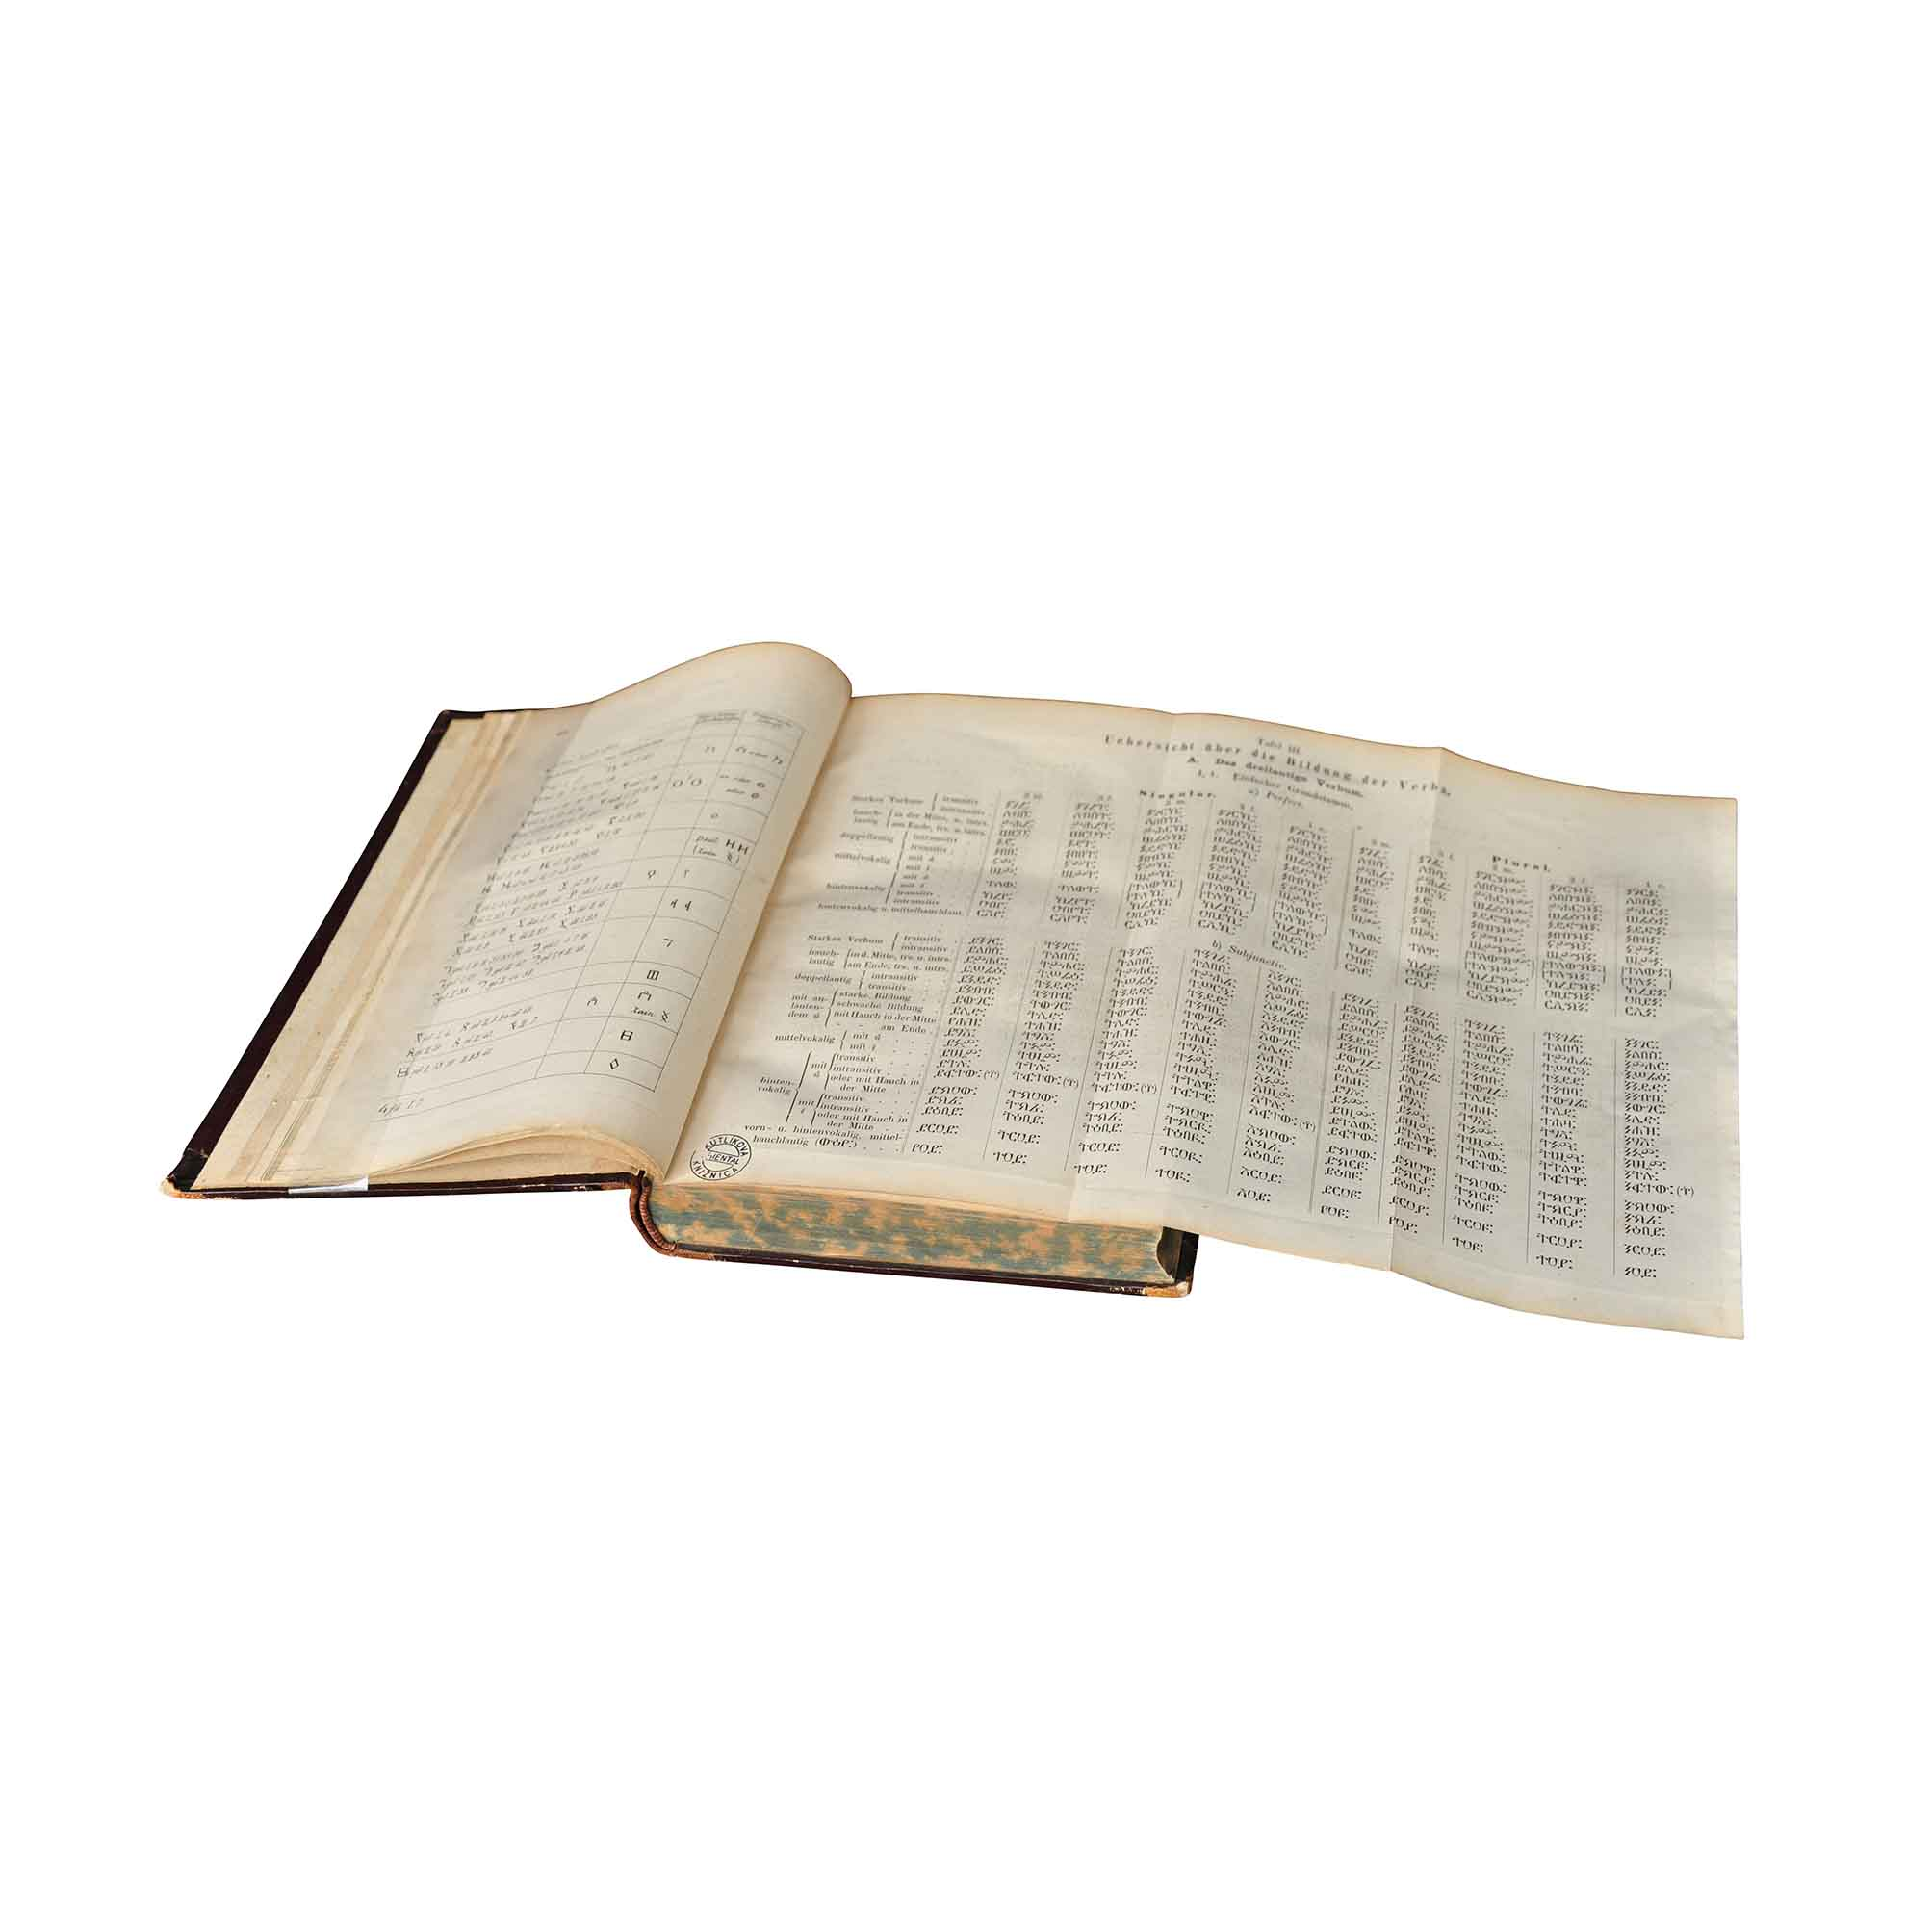 1178-Dillmann-Aethiopisch-1857-Konjugation-Tabelle-frei-N.jpg